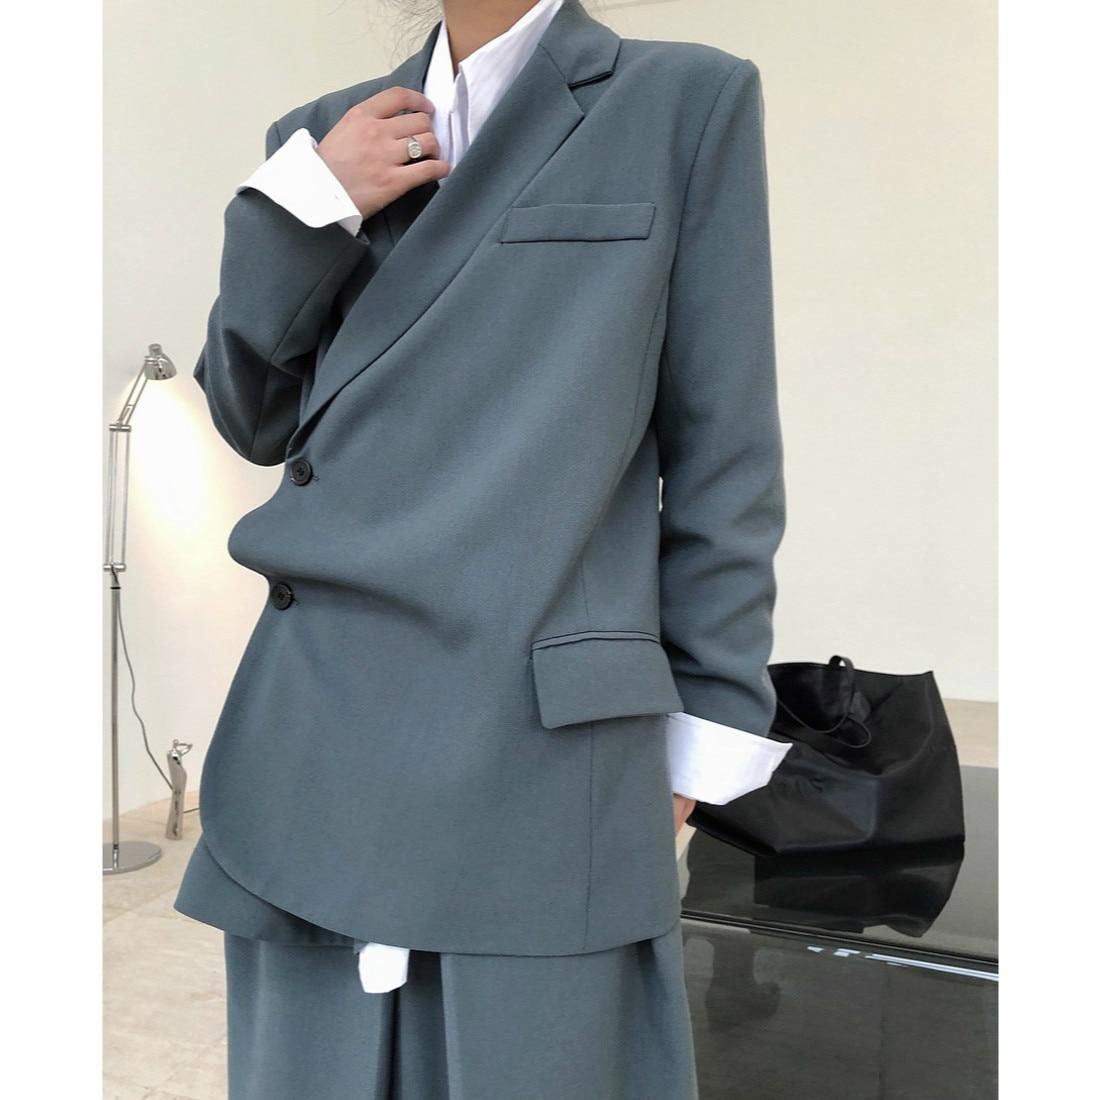 High Quality Coats Women 2020 Autumn New Fashionable Stylish Design Oblique Placket Loose Long Sleeve Blazer Feminino